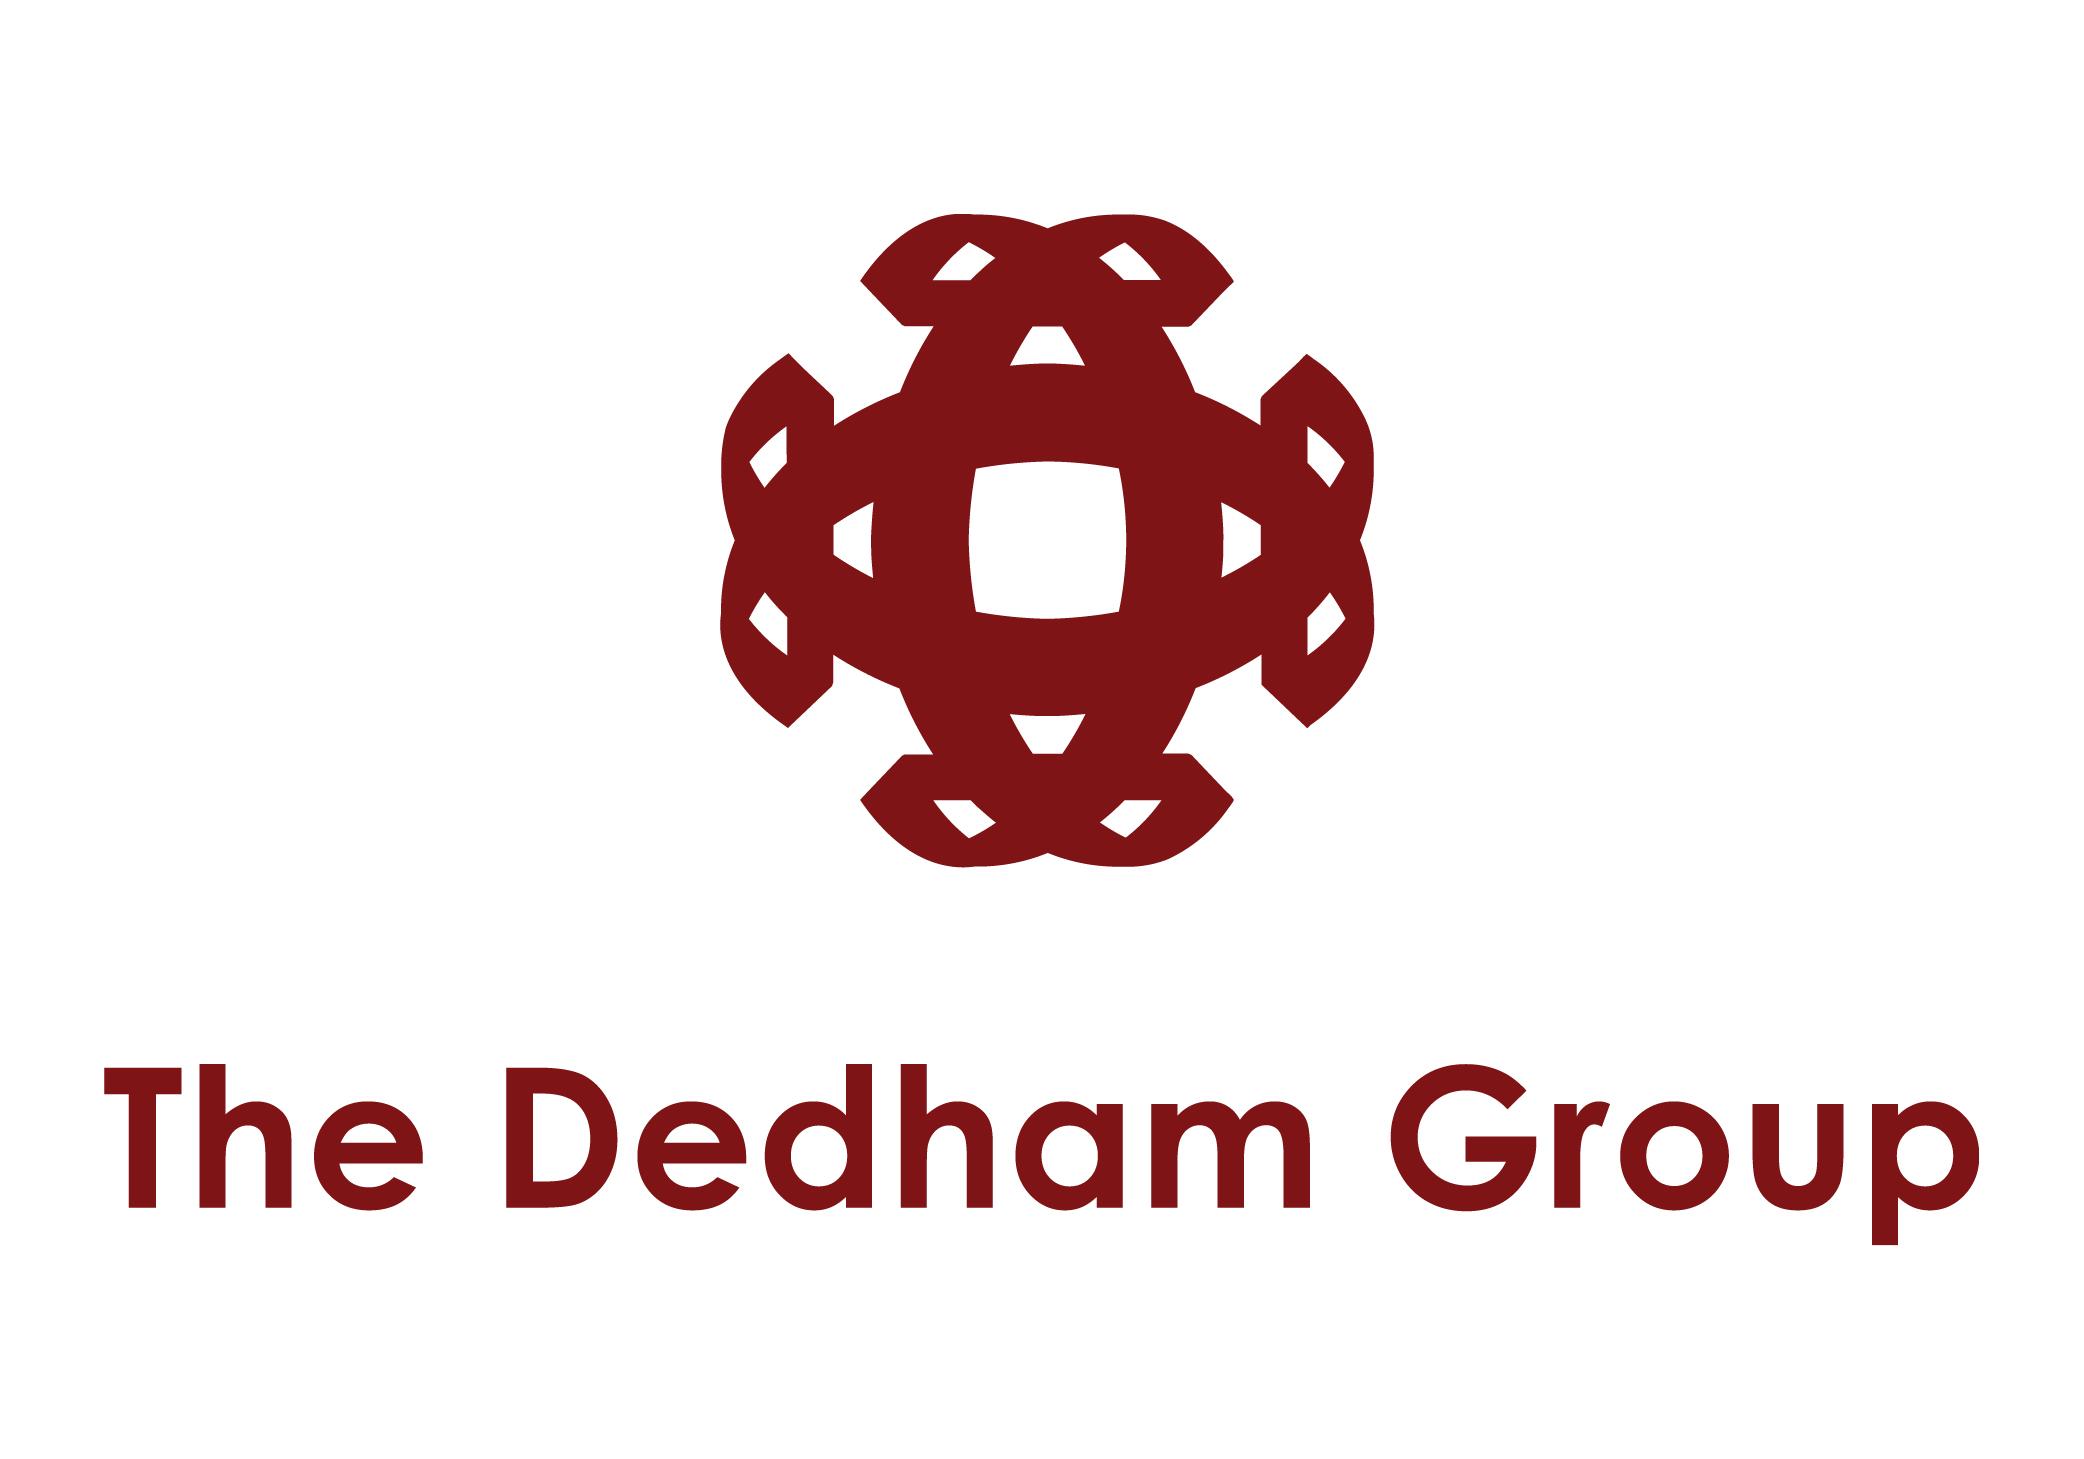 The Dedham Group